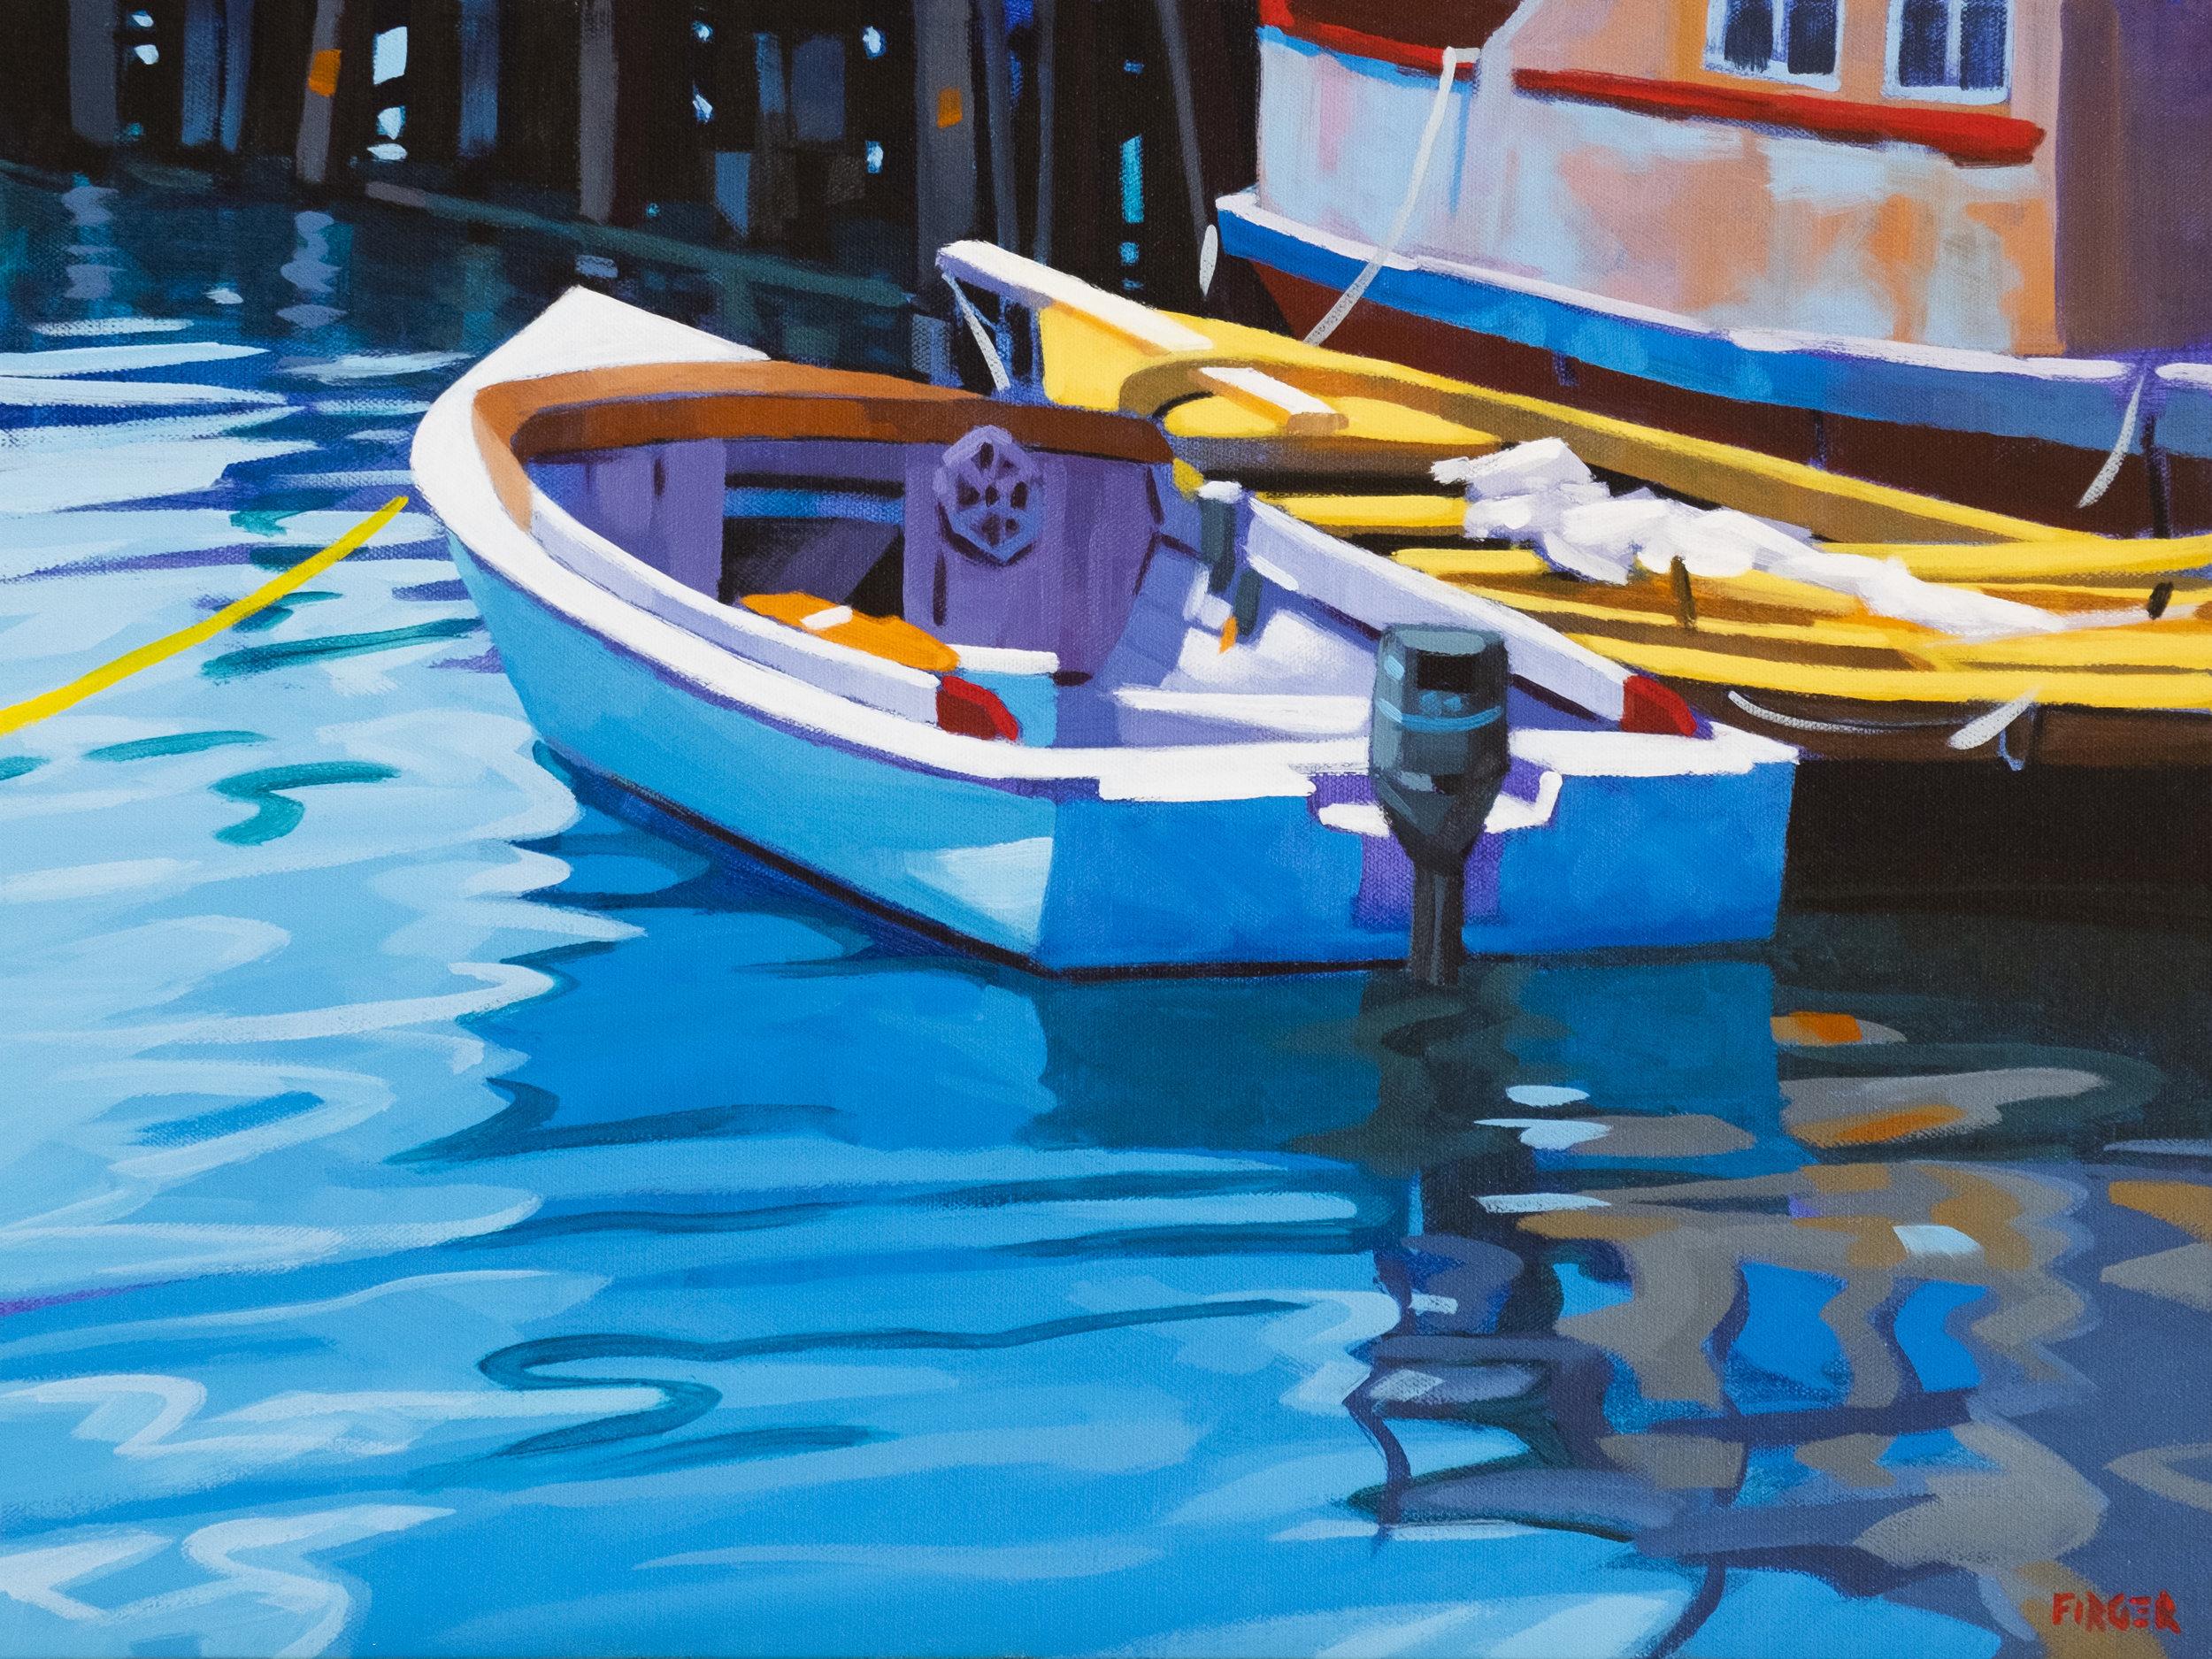 Dockside Reflections - 18 x 24, Acrylic on Canvas